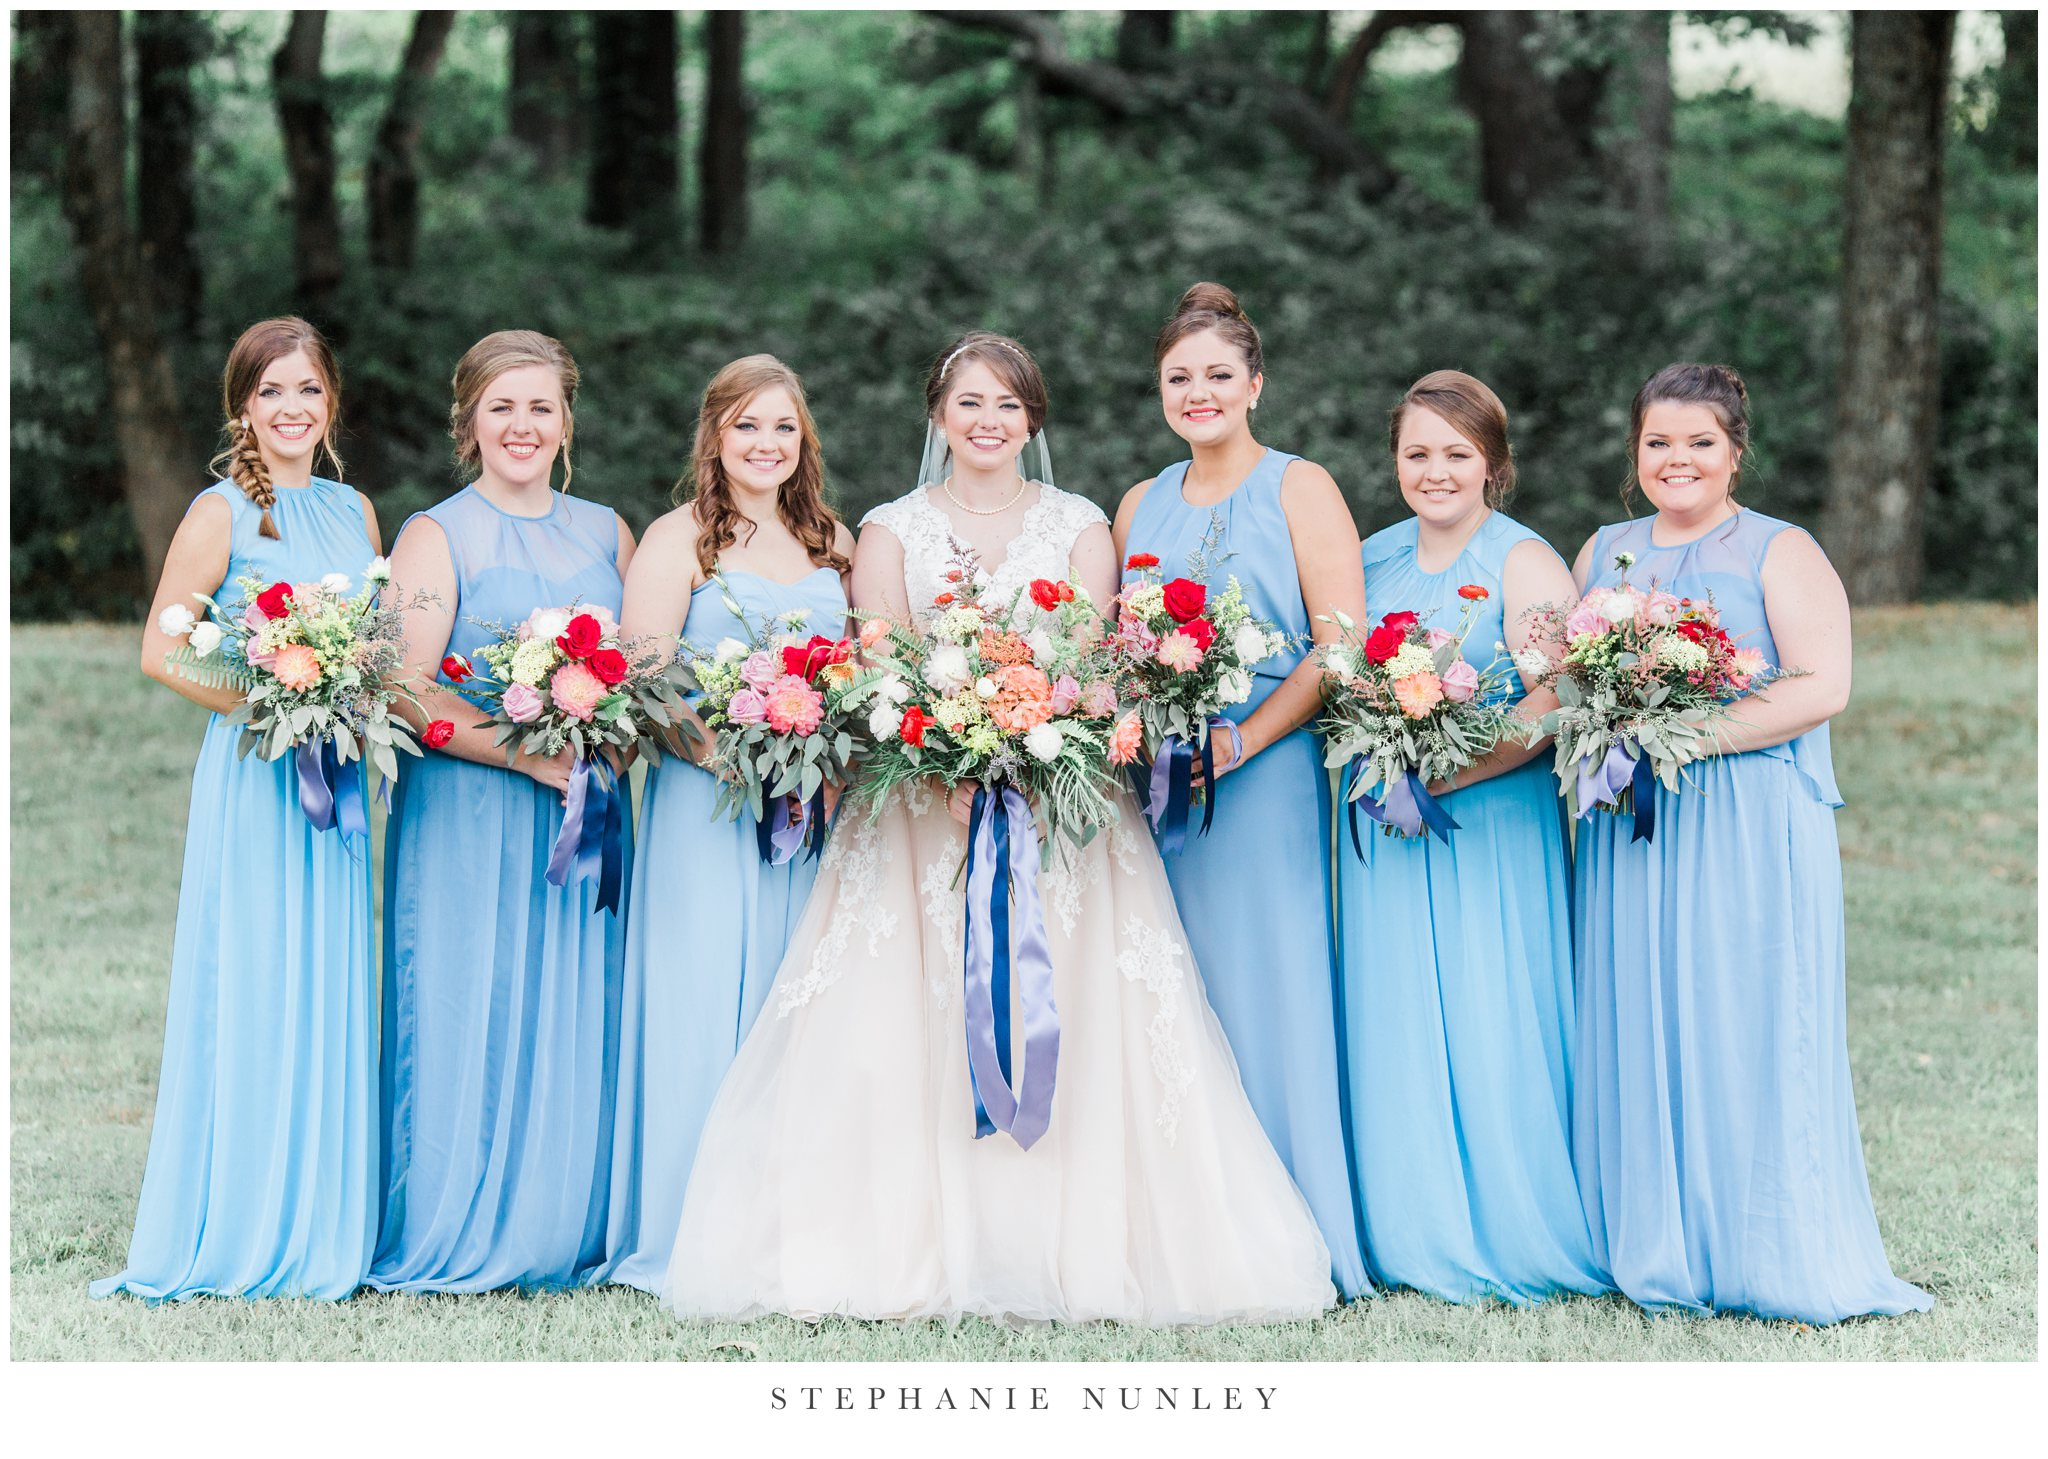 arkansas-wedding-with-lush-wildflower-bouquet-0065.jpg